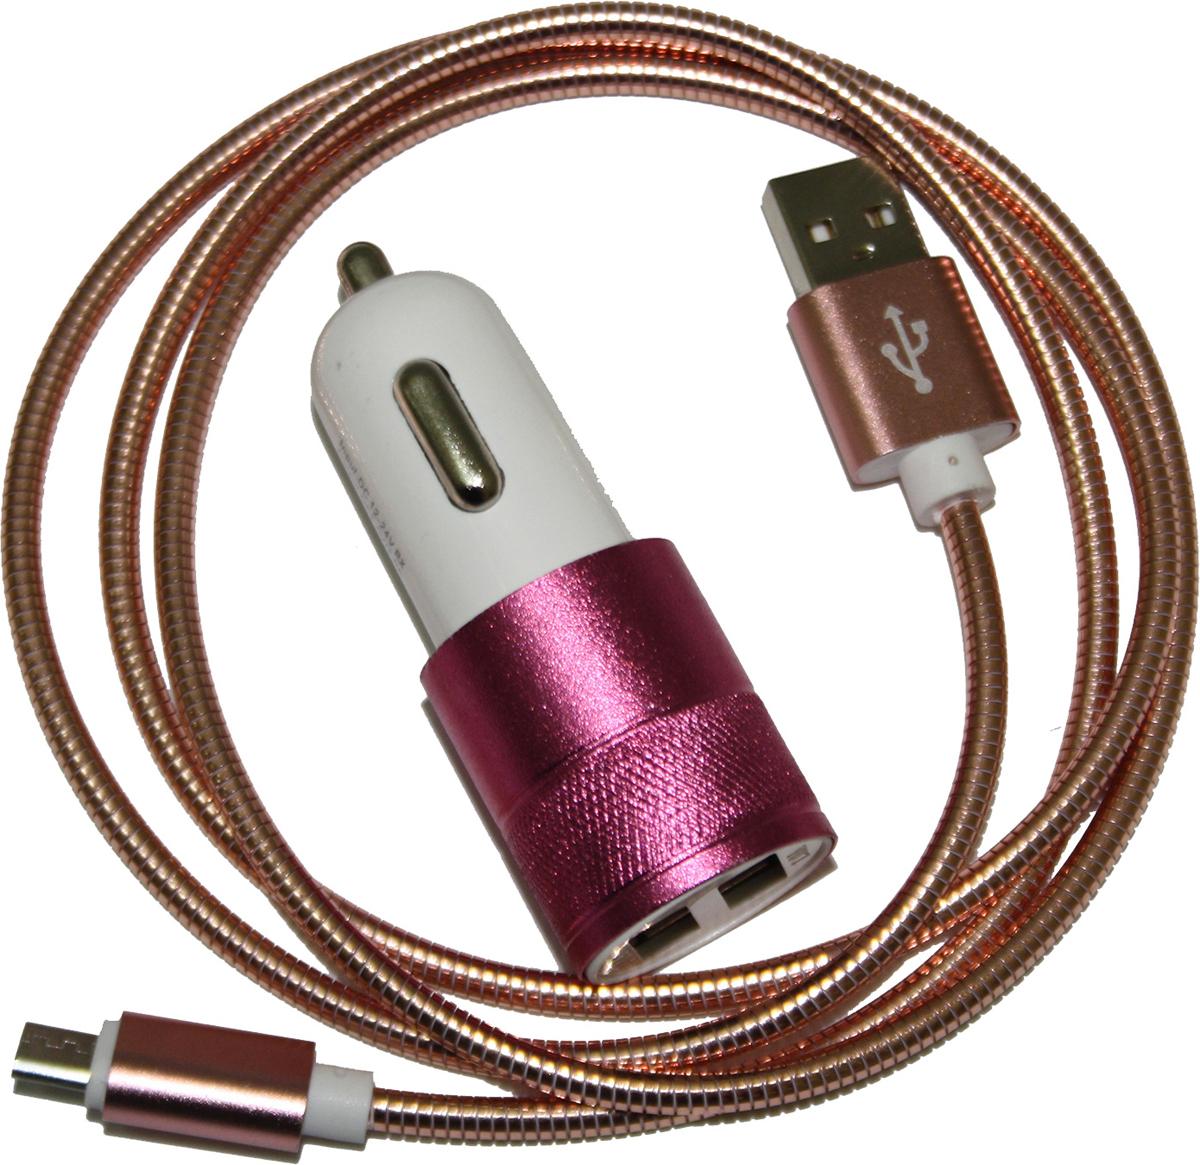 Розетка прикуривателя AvtoVins AVTO VINS_7027523 автомобильное зарядное устройство belkin f8j186bt04 c00 кабель usb apple 8 pin розовый